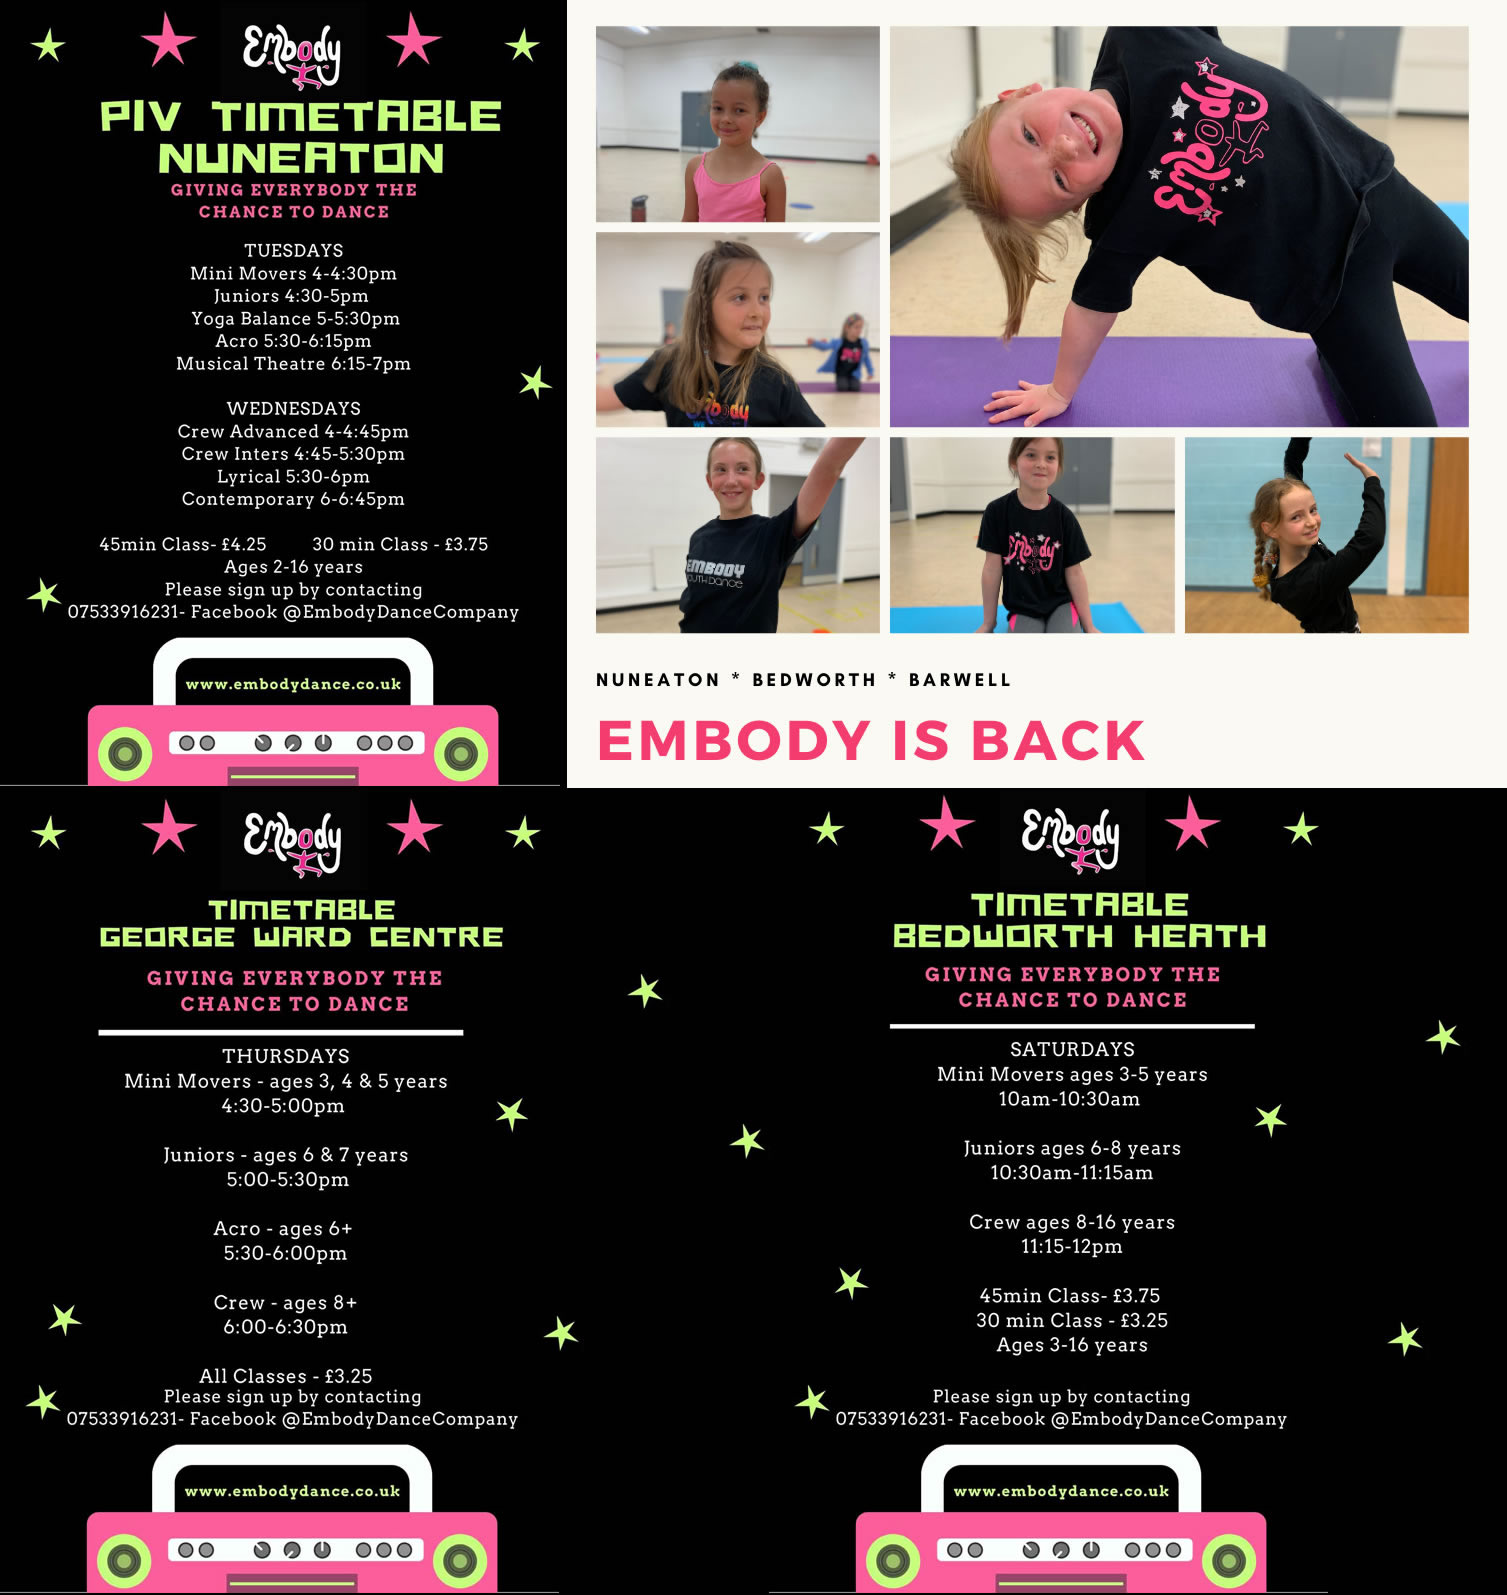 Embody Dance Company